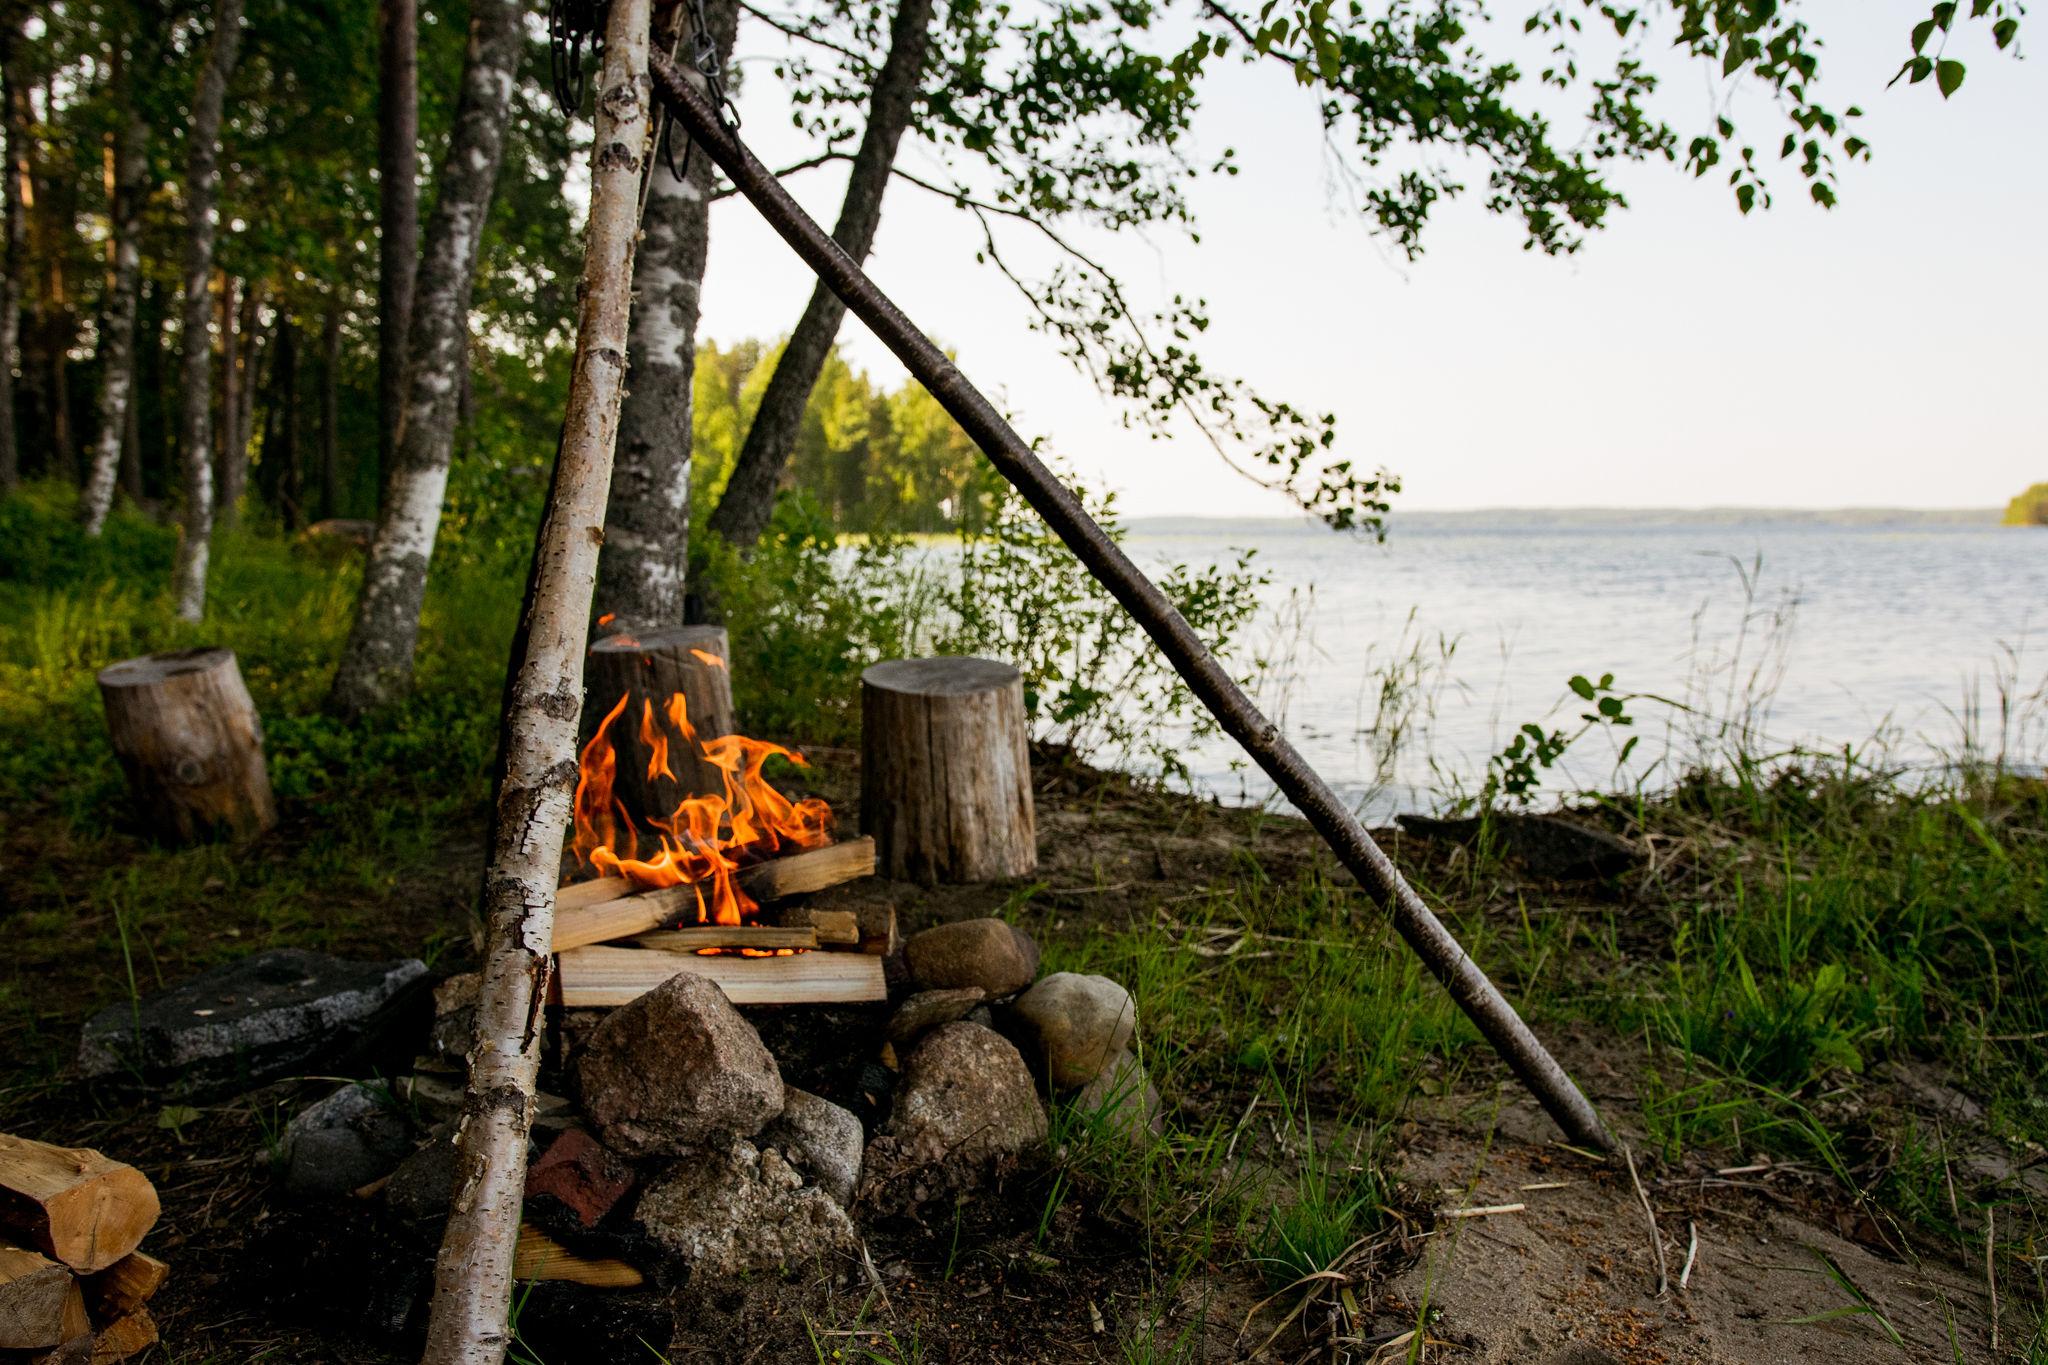 lakeside summer campfire in saimaa, finland